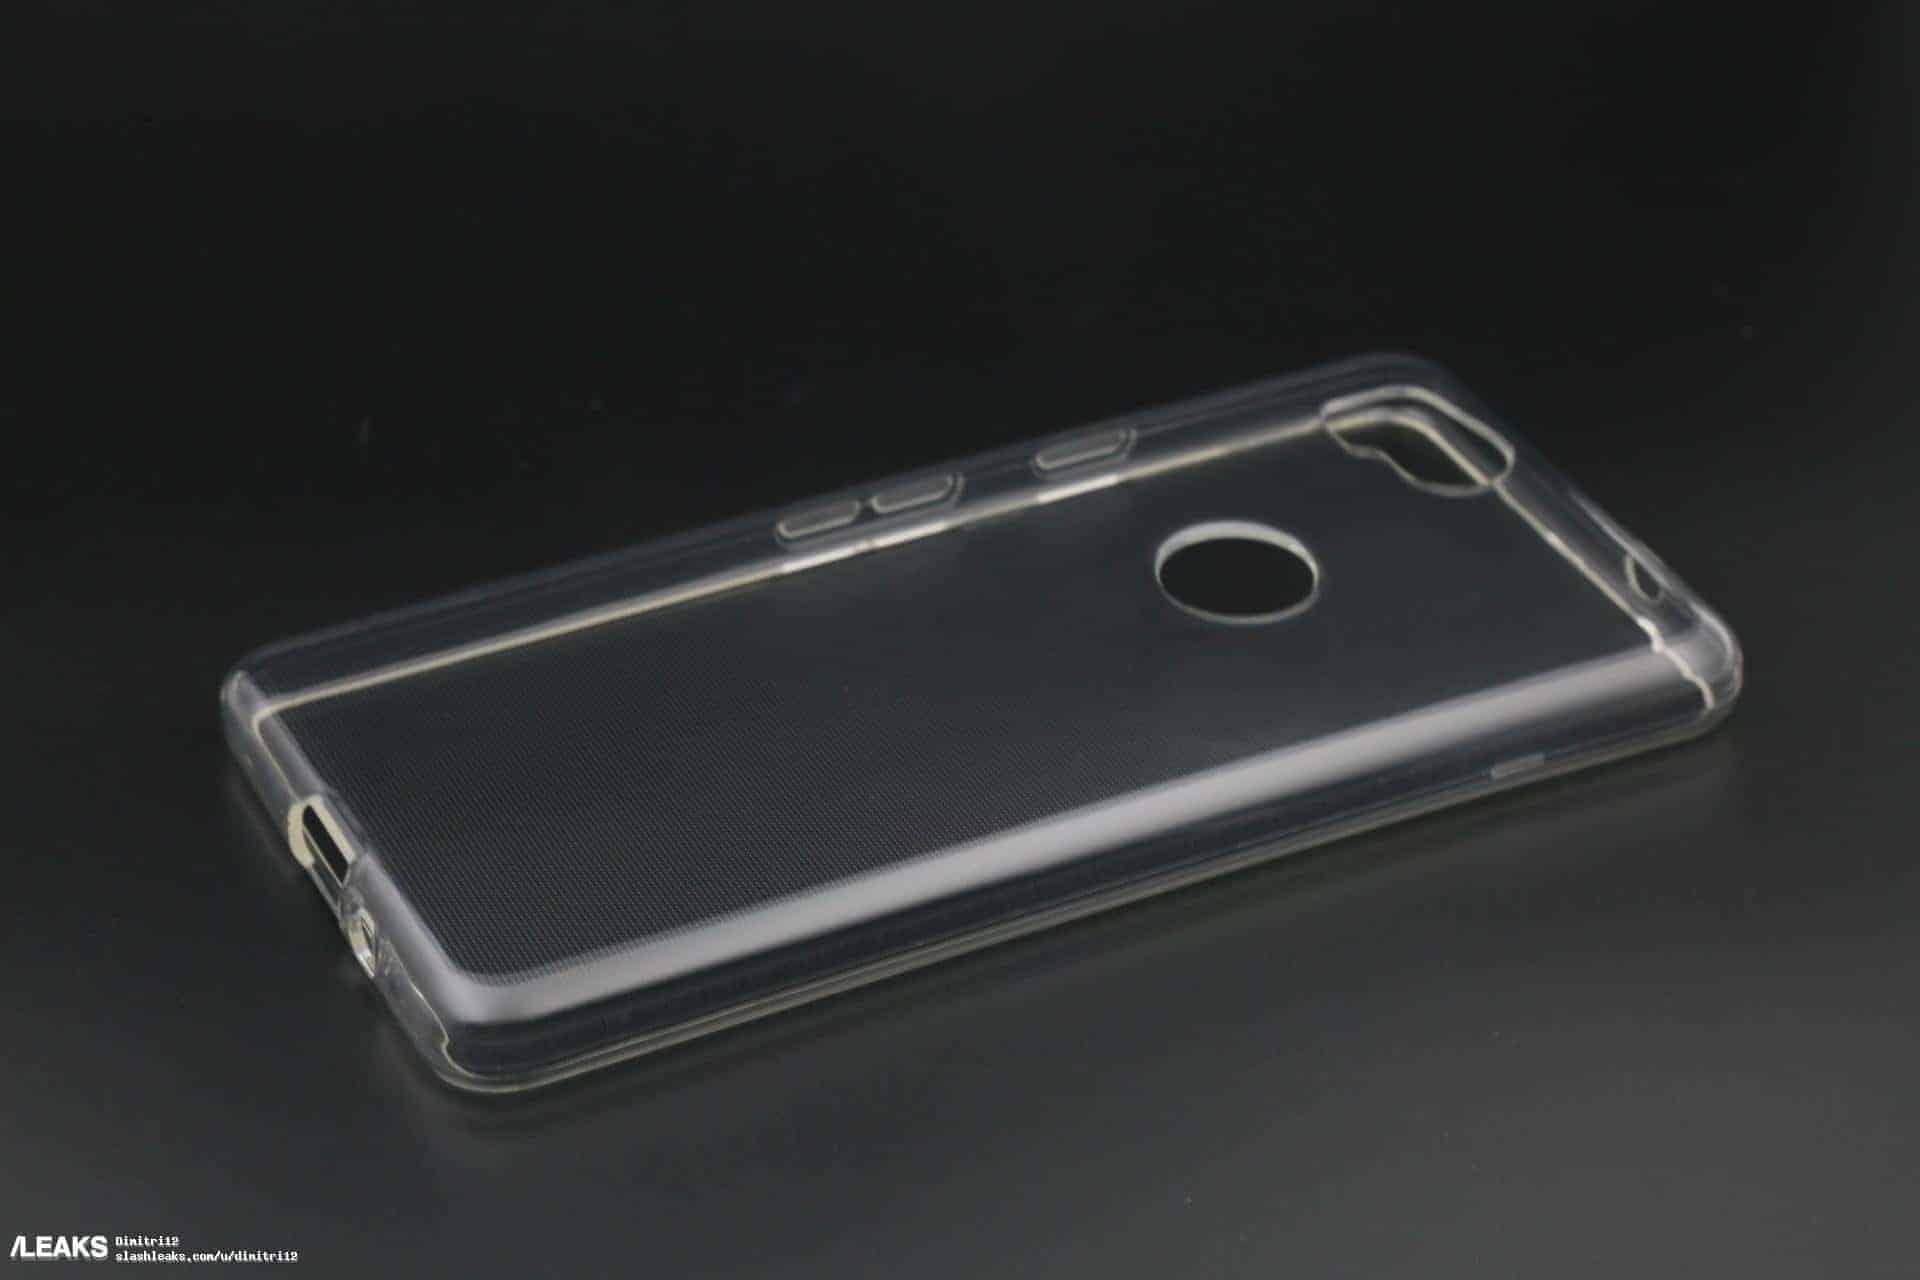 Google Pixel 2 Case SlashLeaks 3